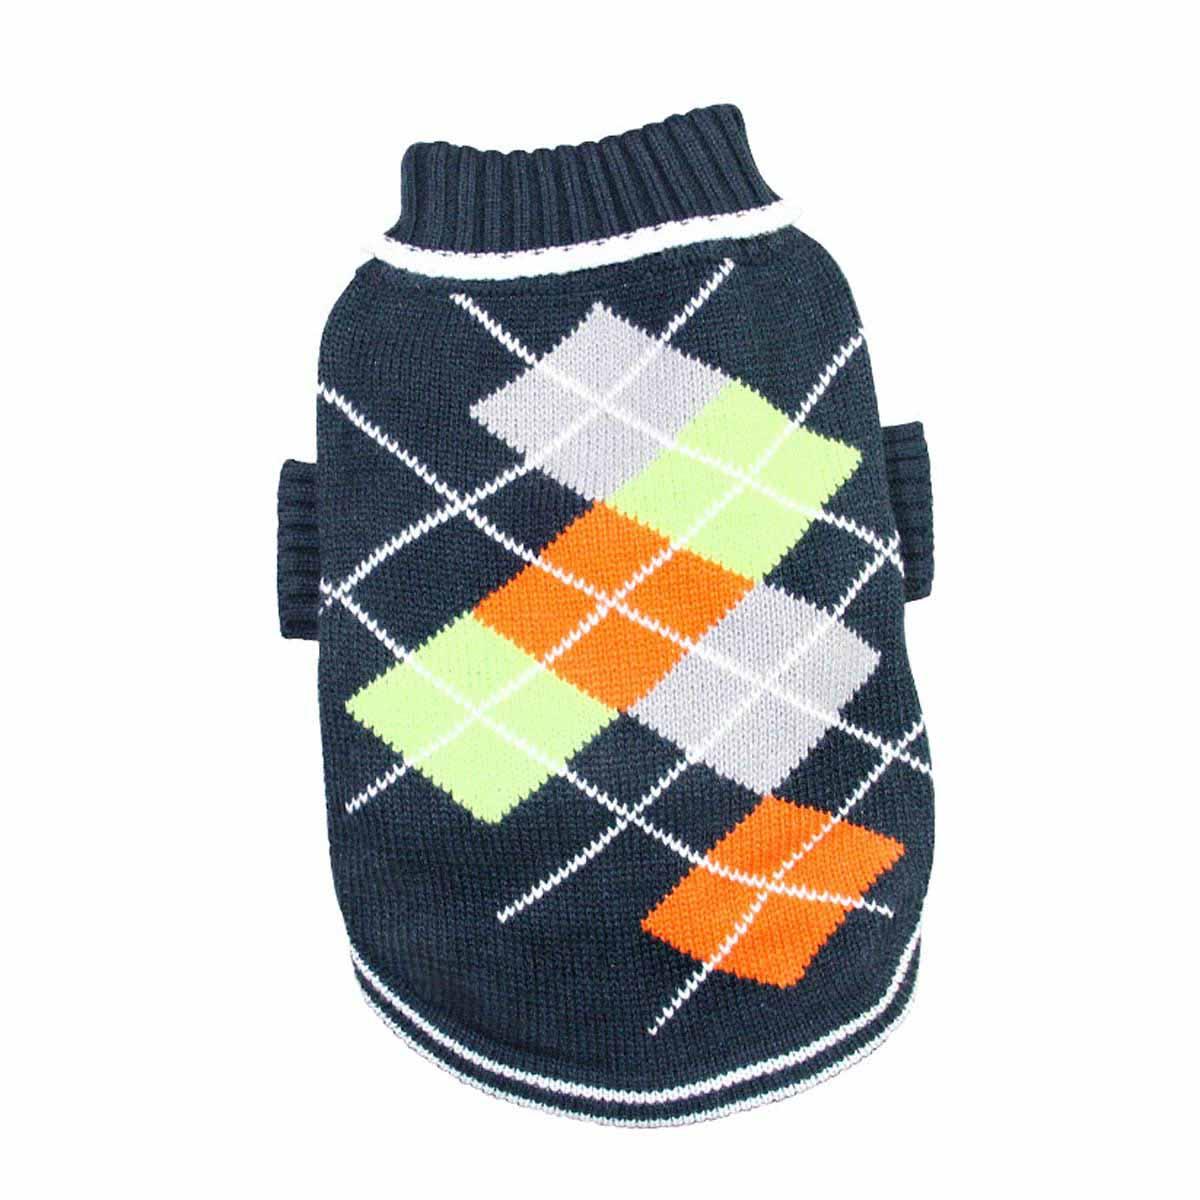 Argyle Pattern Turtleneck Dog Sweater from Klippo - Navy